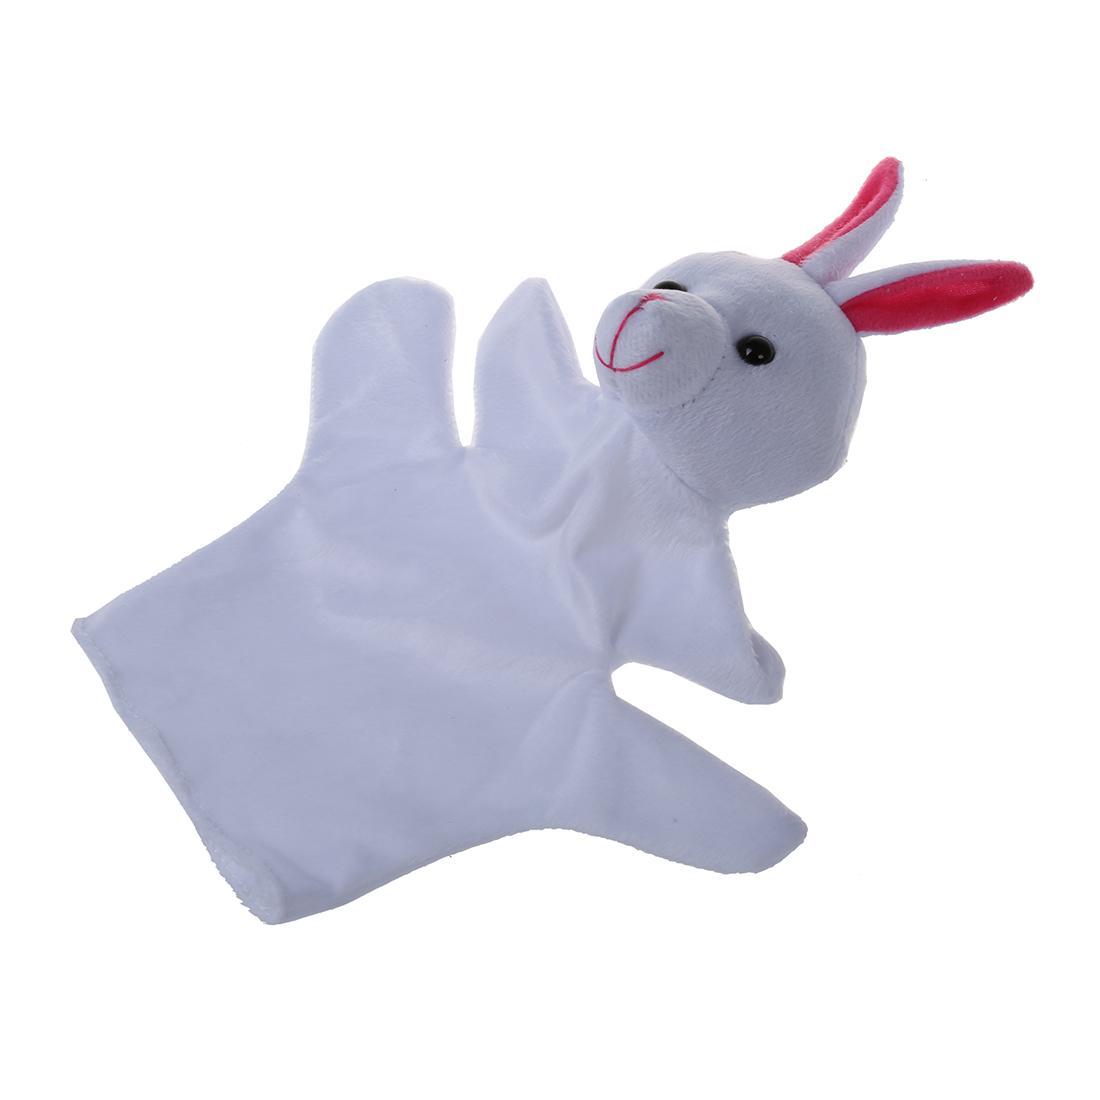 Cute Baby Child Zoo Farm Animal Hand Sock Glove Puppet Finger Sack Plush Toy NewModel:Rabbit